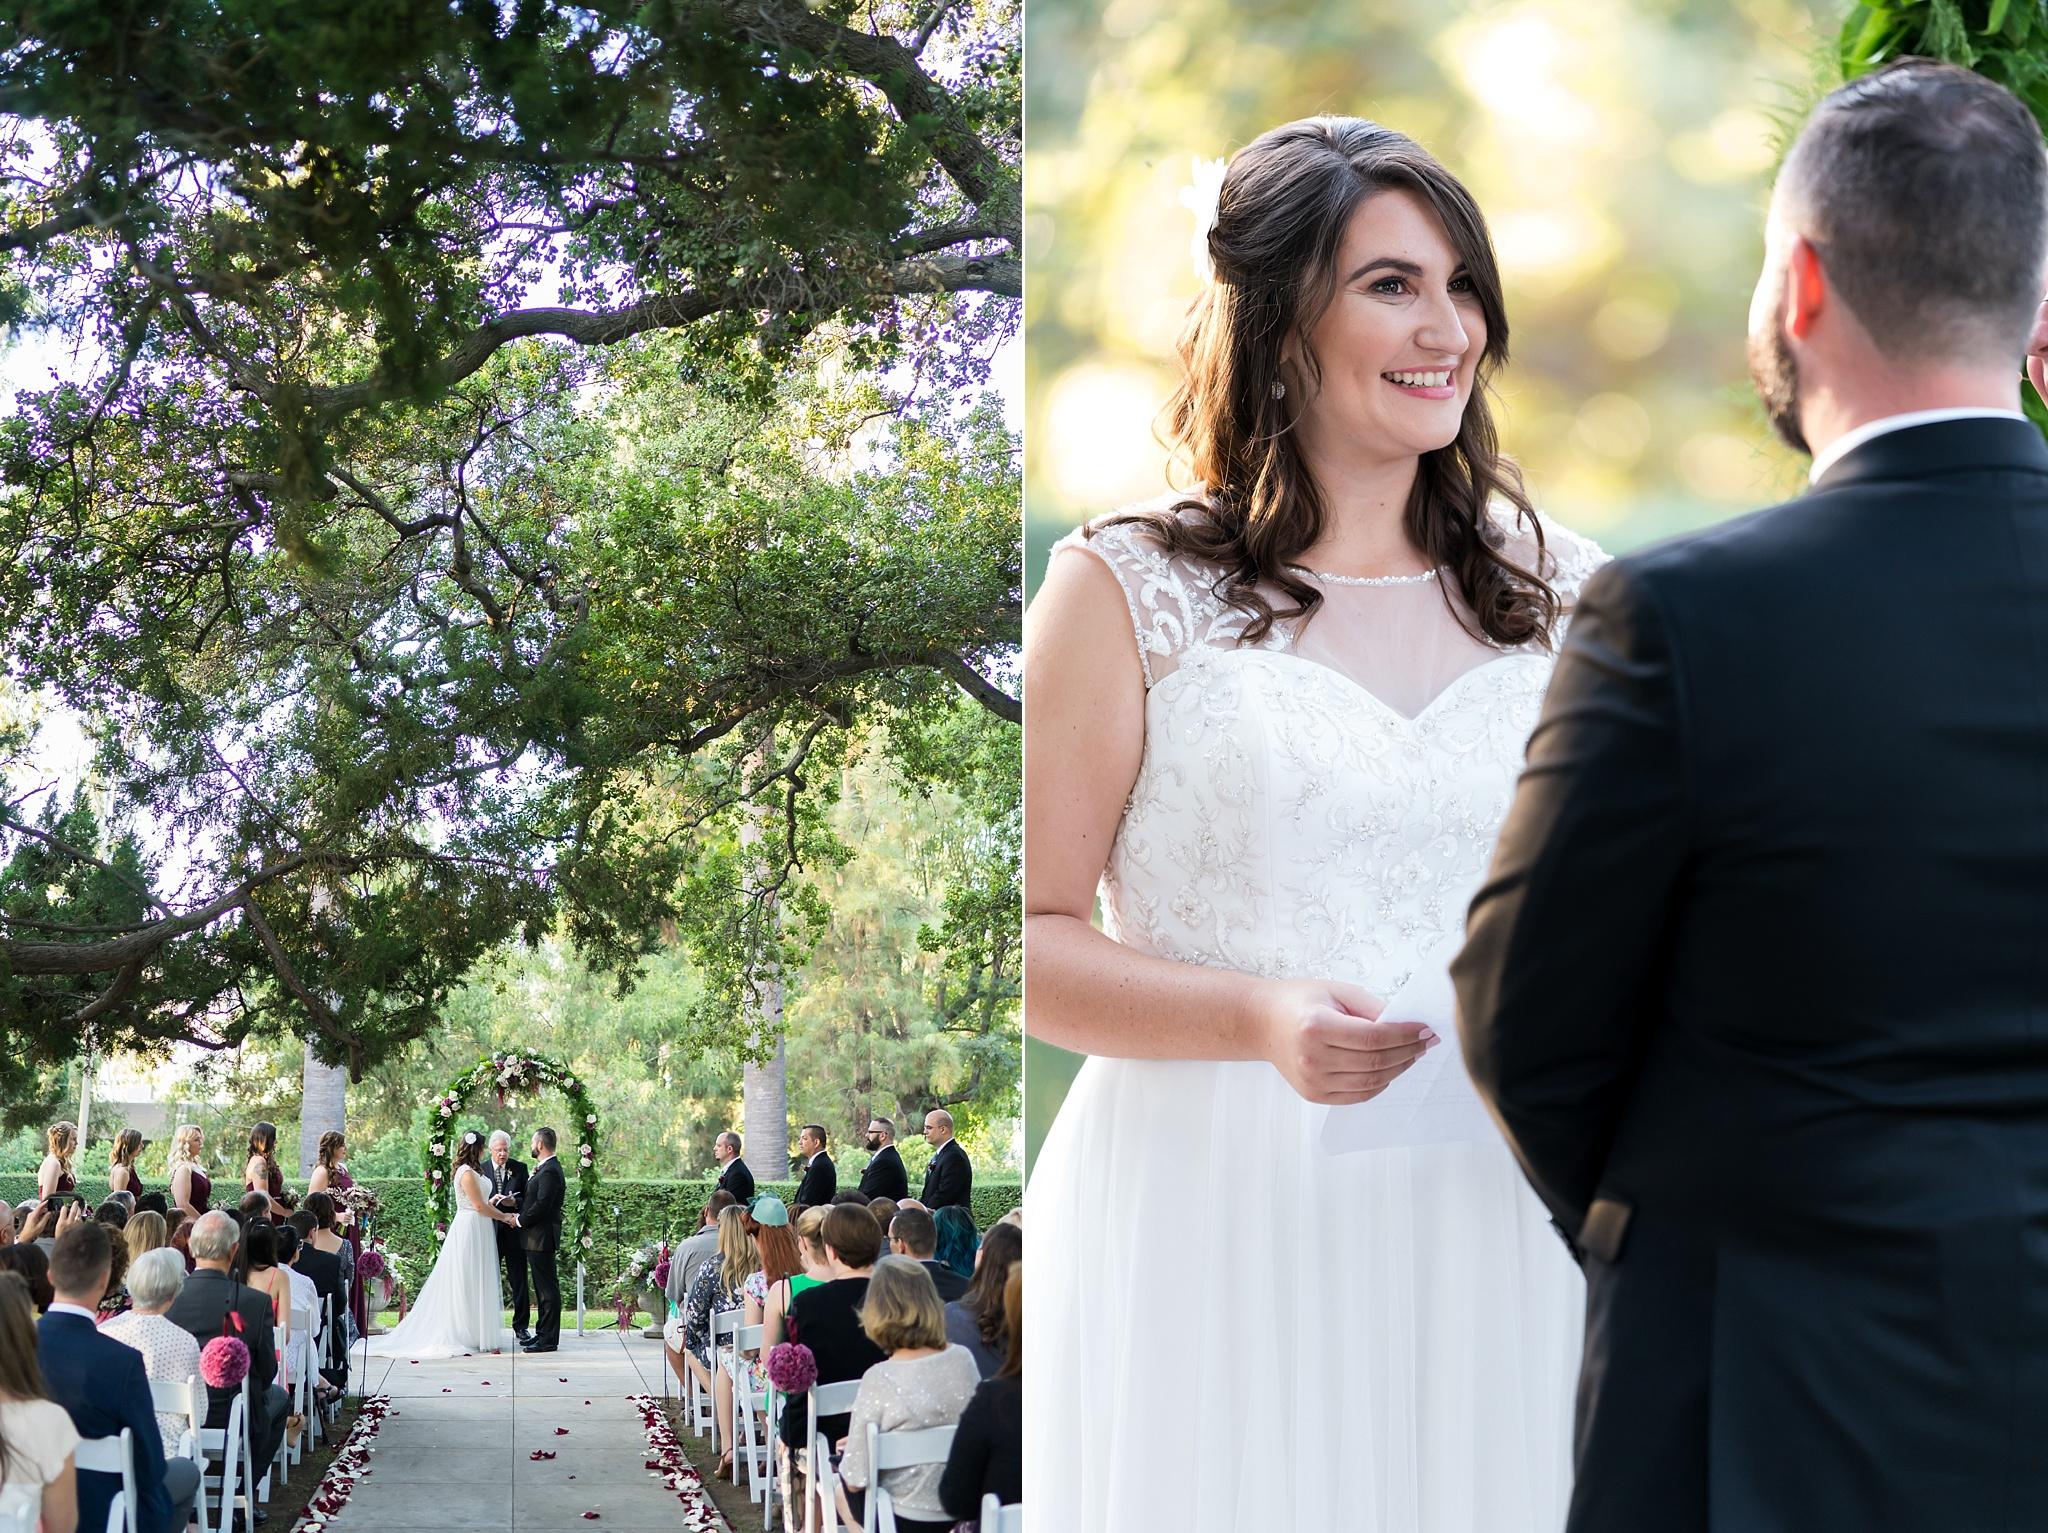 TommyandAmanda_WEDDING_BrienneMichelle_Ceremony_050_BLOG.jpg